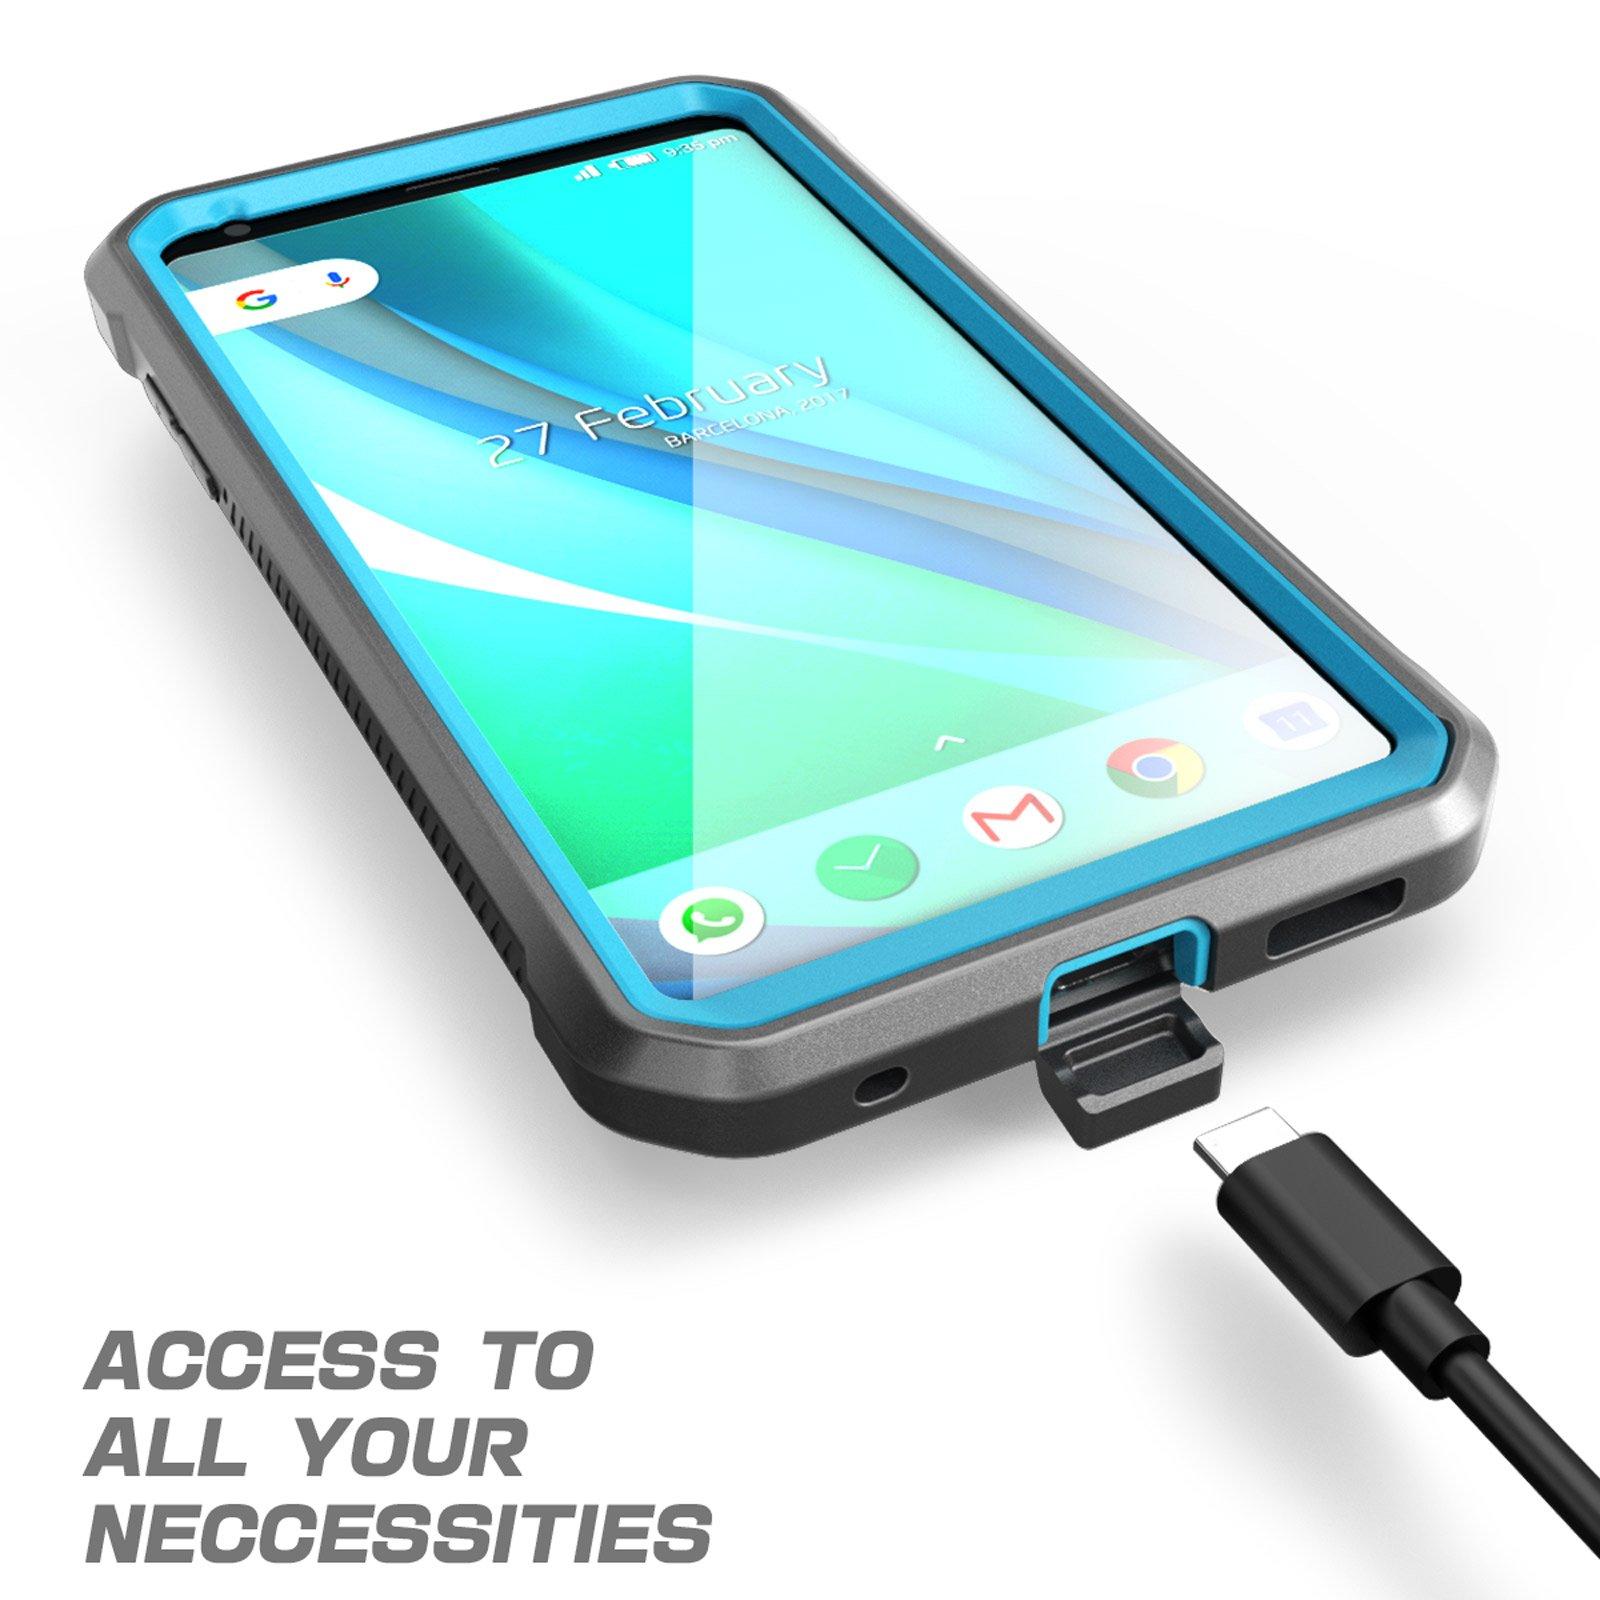 LG V30 Case, SUPCASE Full-body Rugged Holster Case with Built-in Screen Protector for LG V30, LG V30s,LG V35,LG V35 ThinQ,LG V30 Plus 2017 Release, Unicorn Beetle PRO Series(Blue/Gray) by SUPCASE (Image #6)